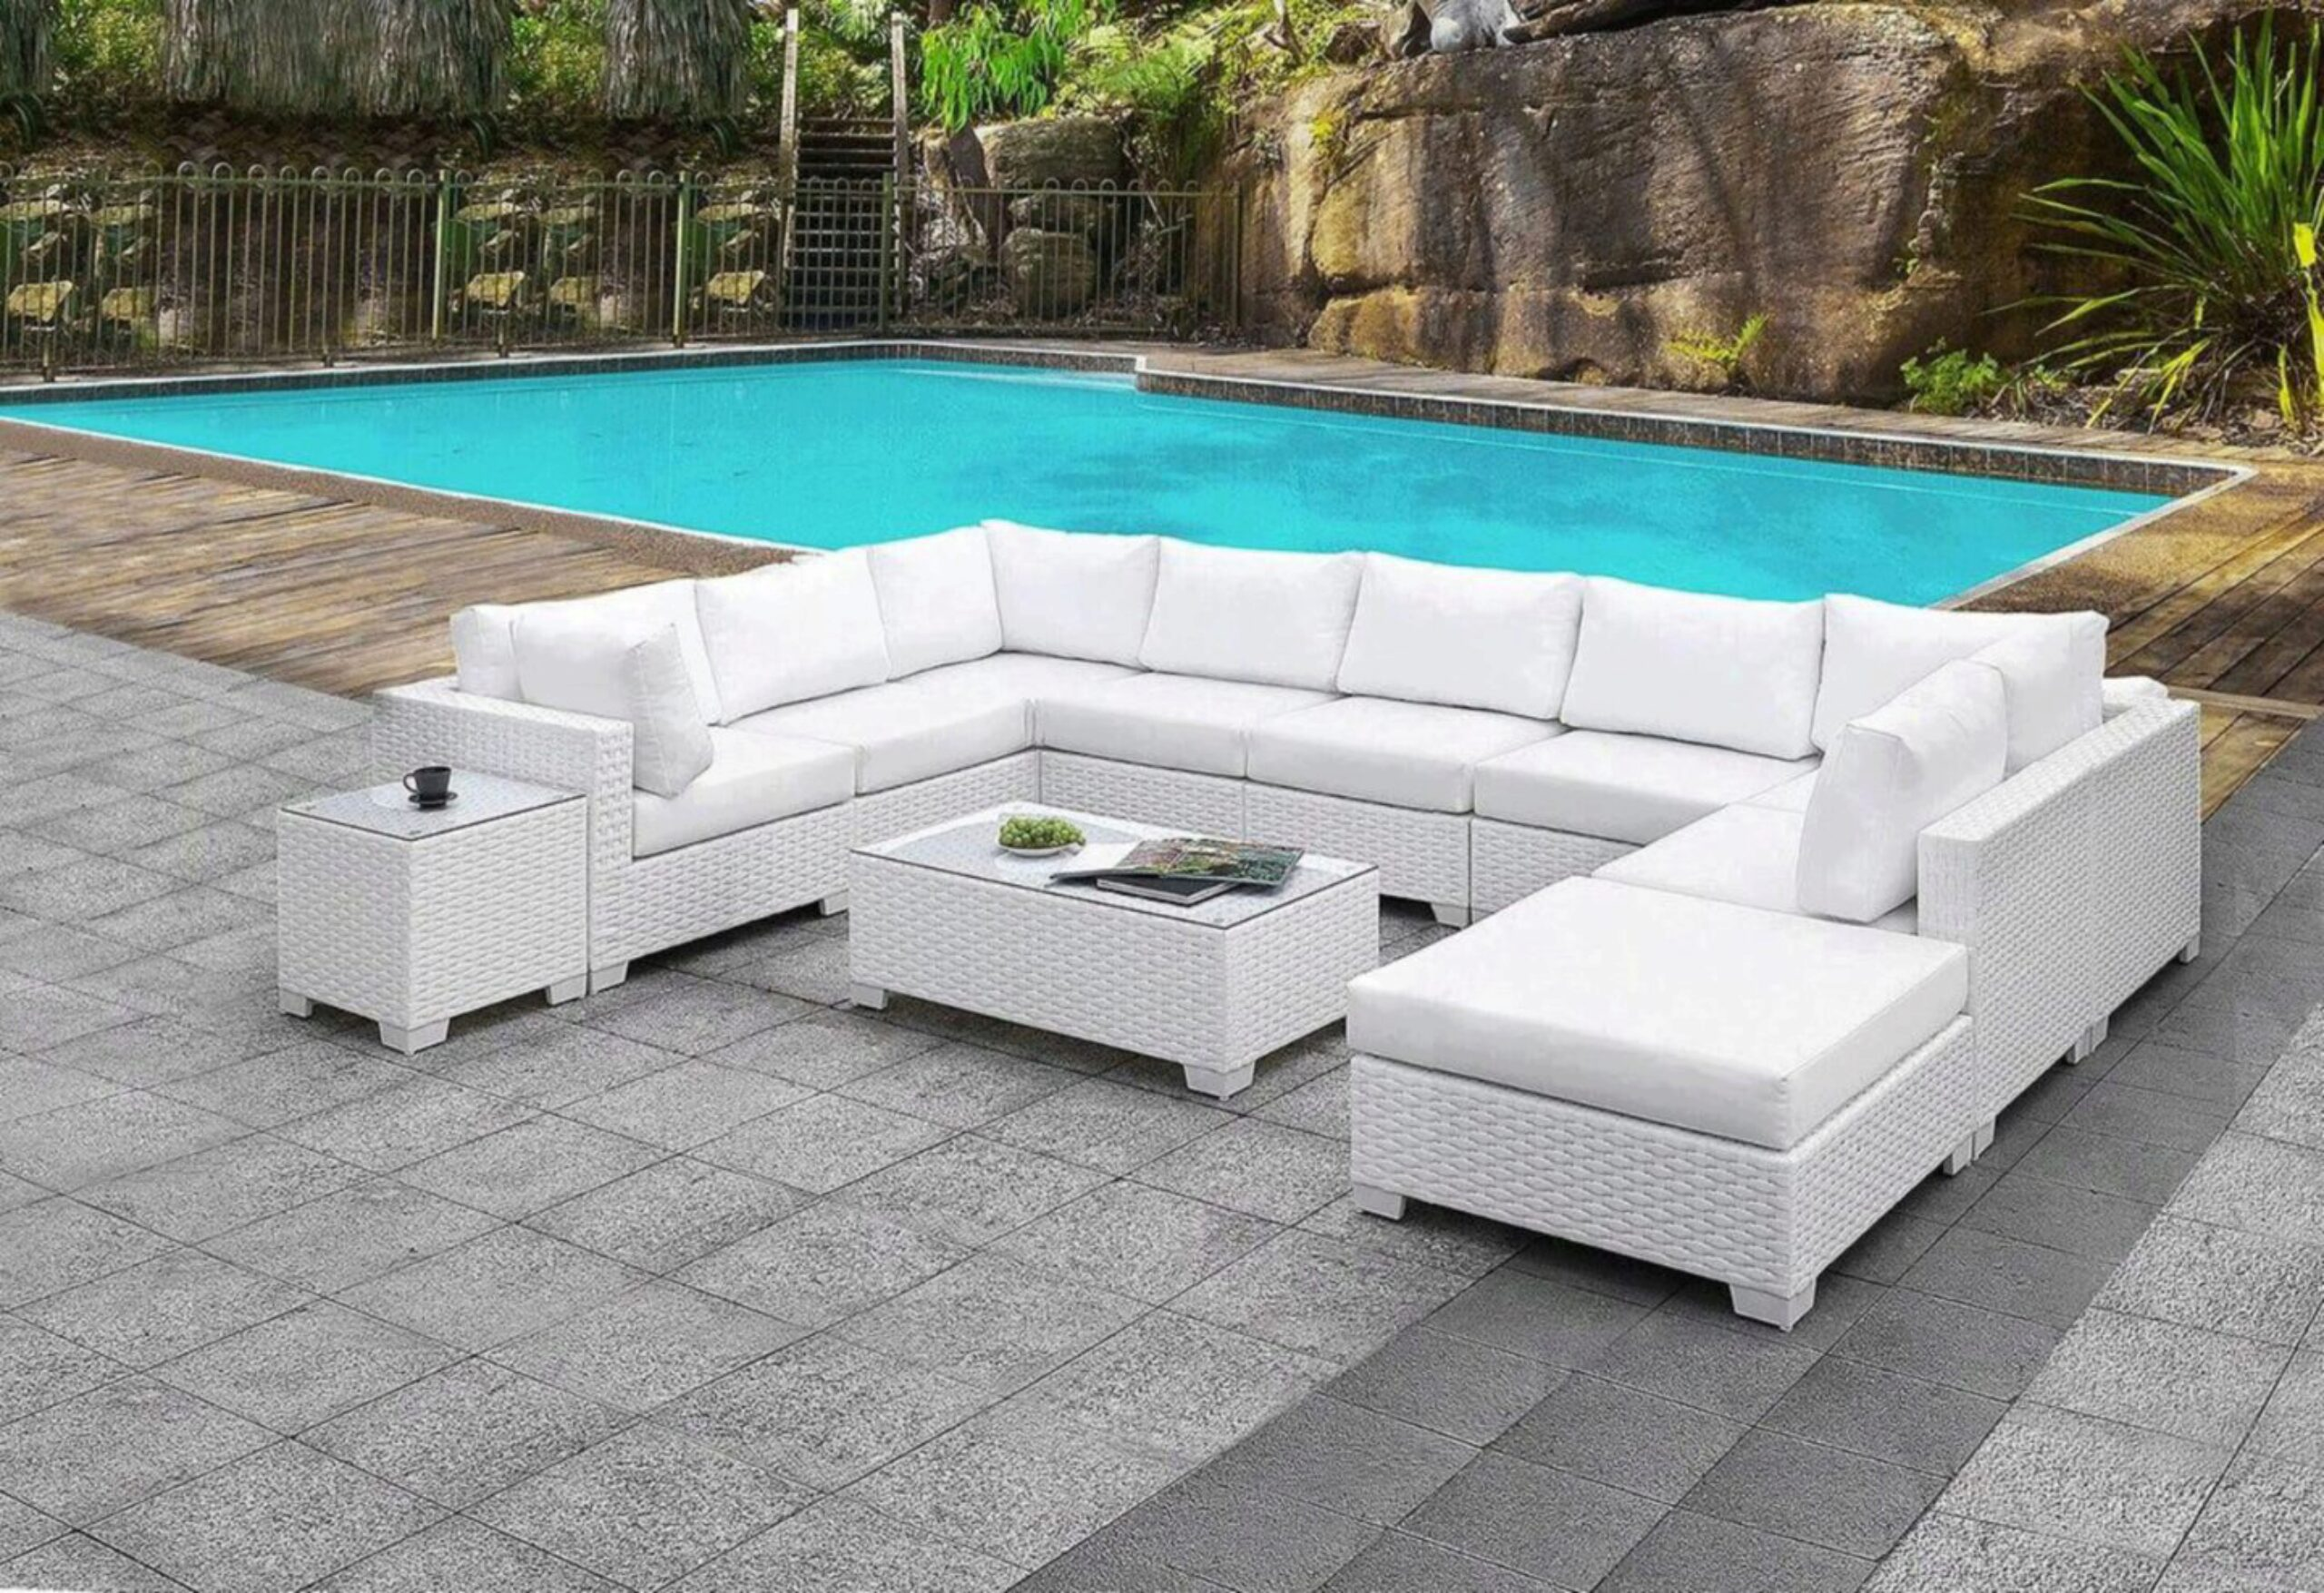 furniture of america somani ii white wicker patio u sectional and coffee table set